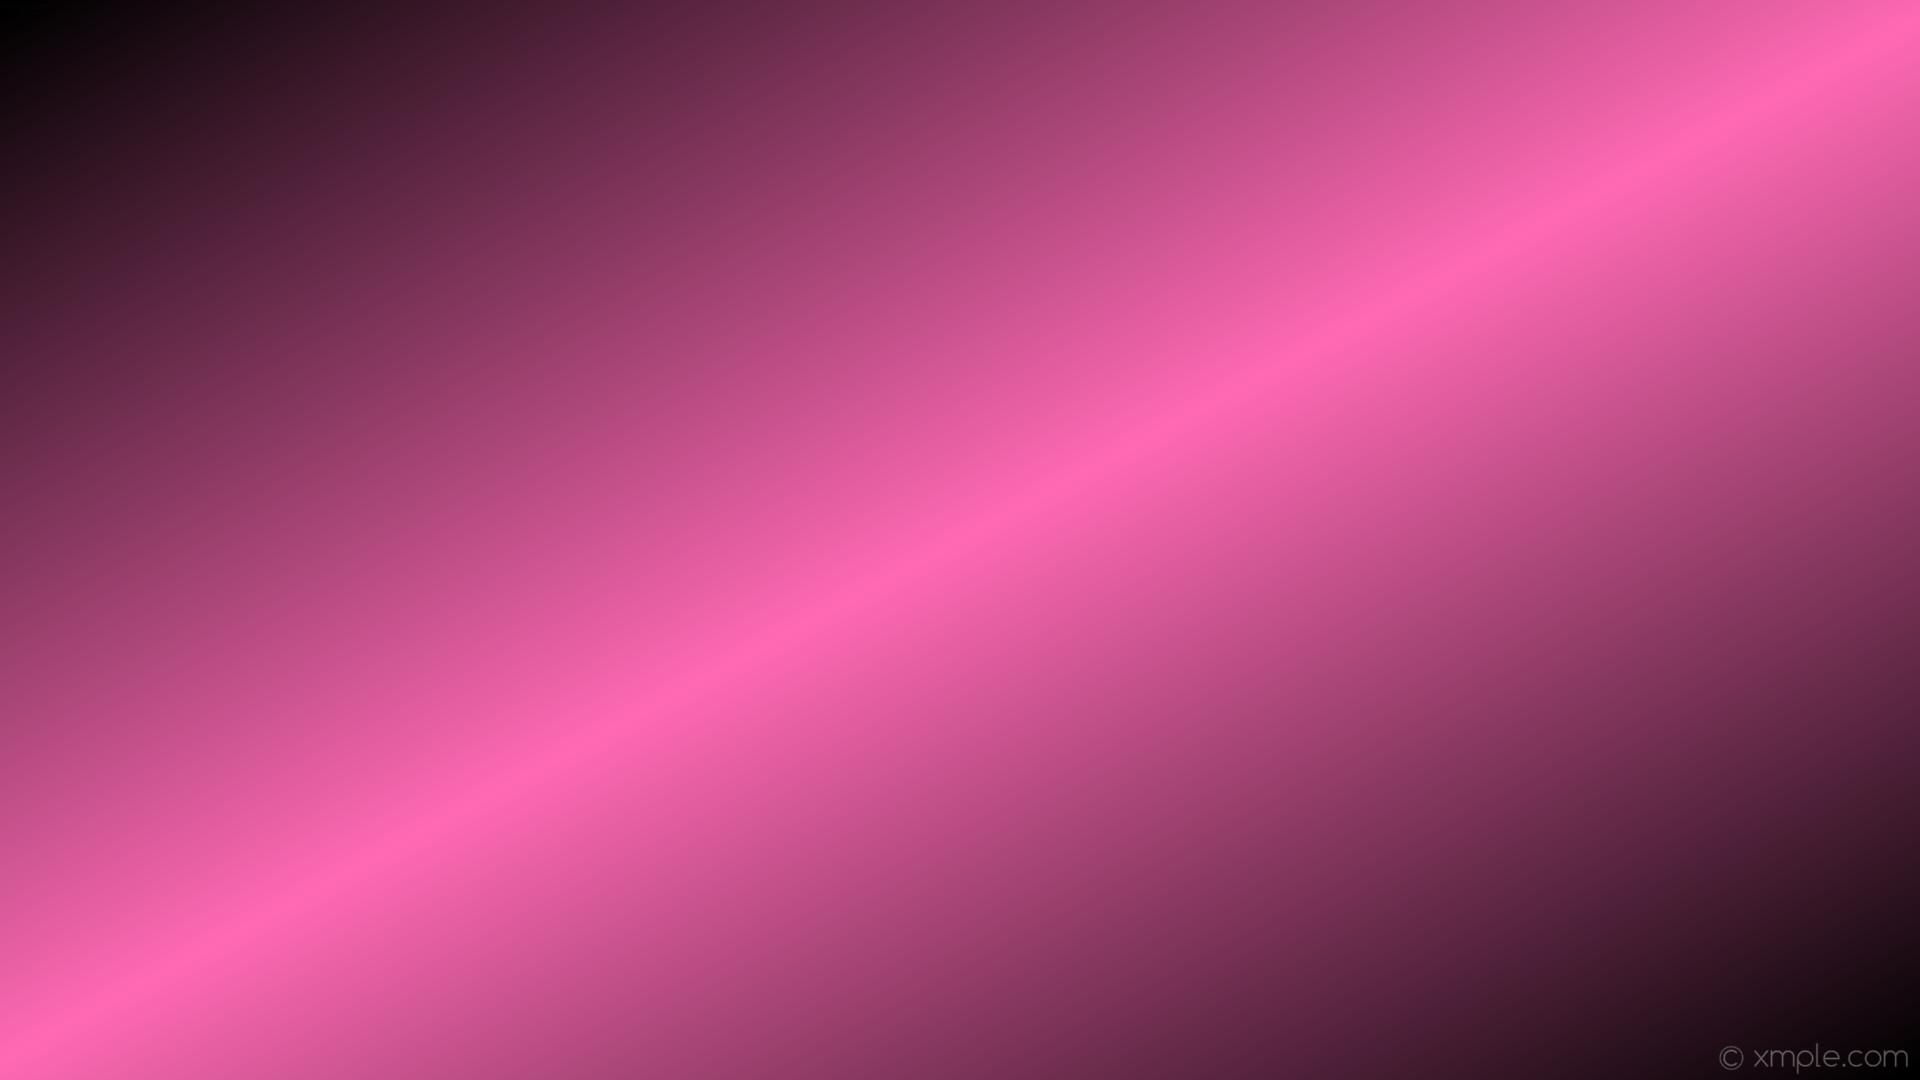 wallpaper linear pink black gradient highlight hot pink #000000 #ff69b4  150° 50%